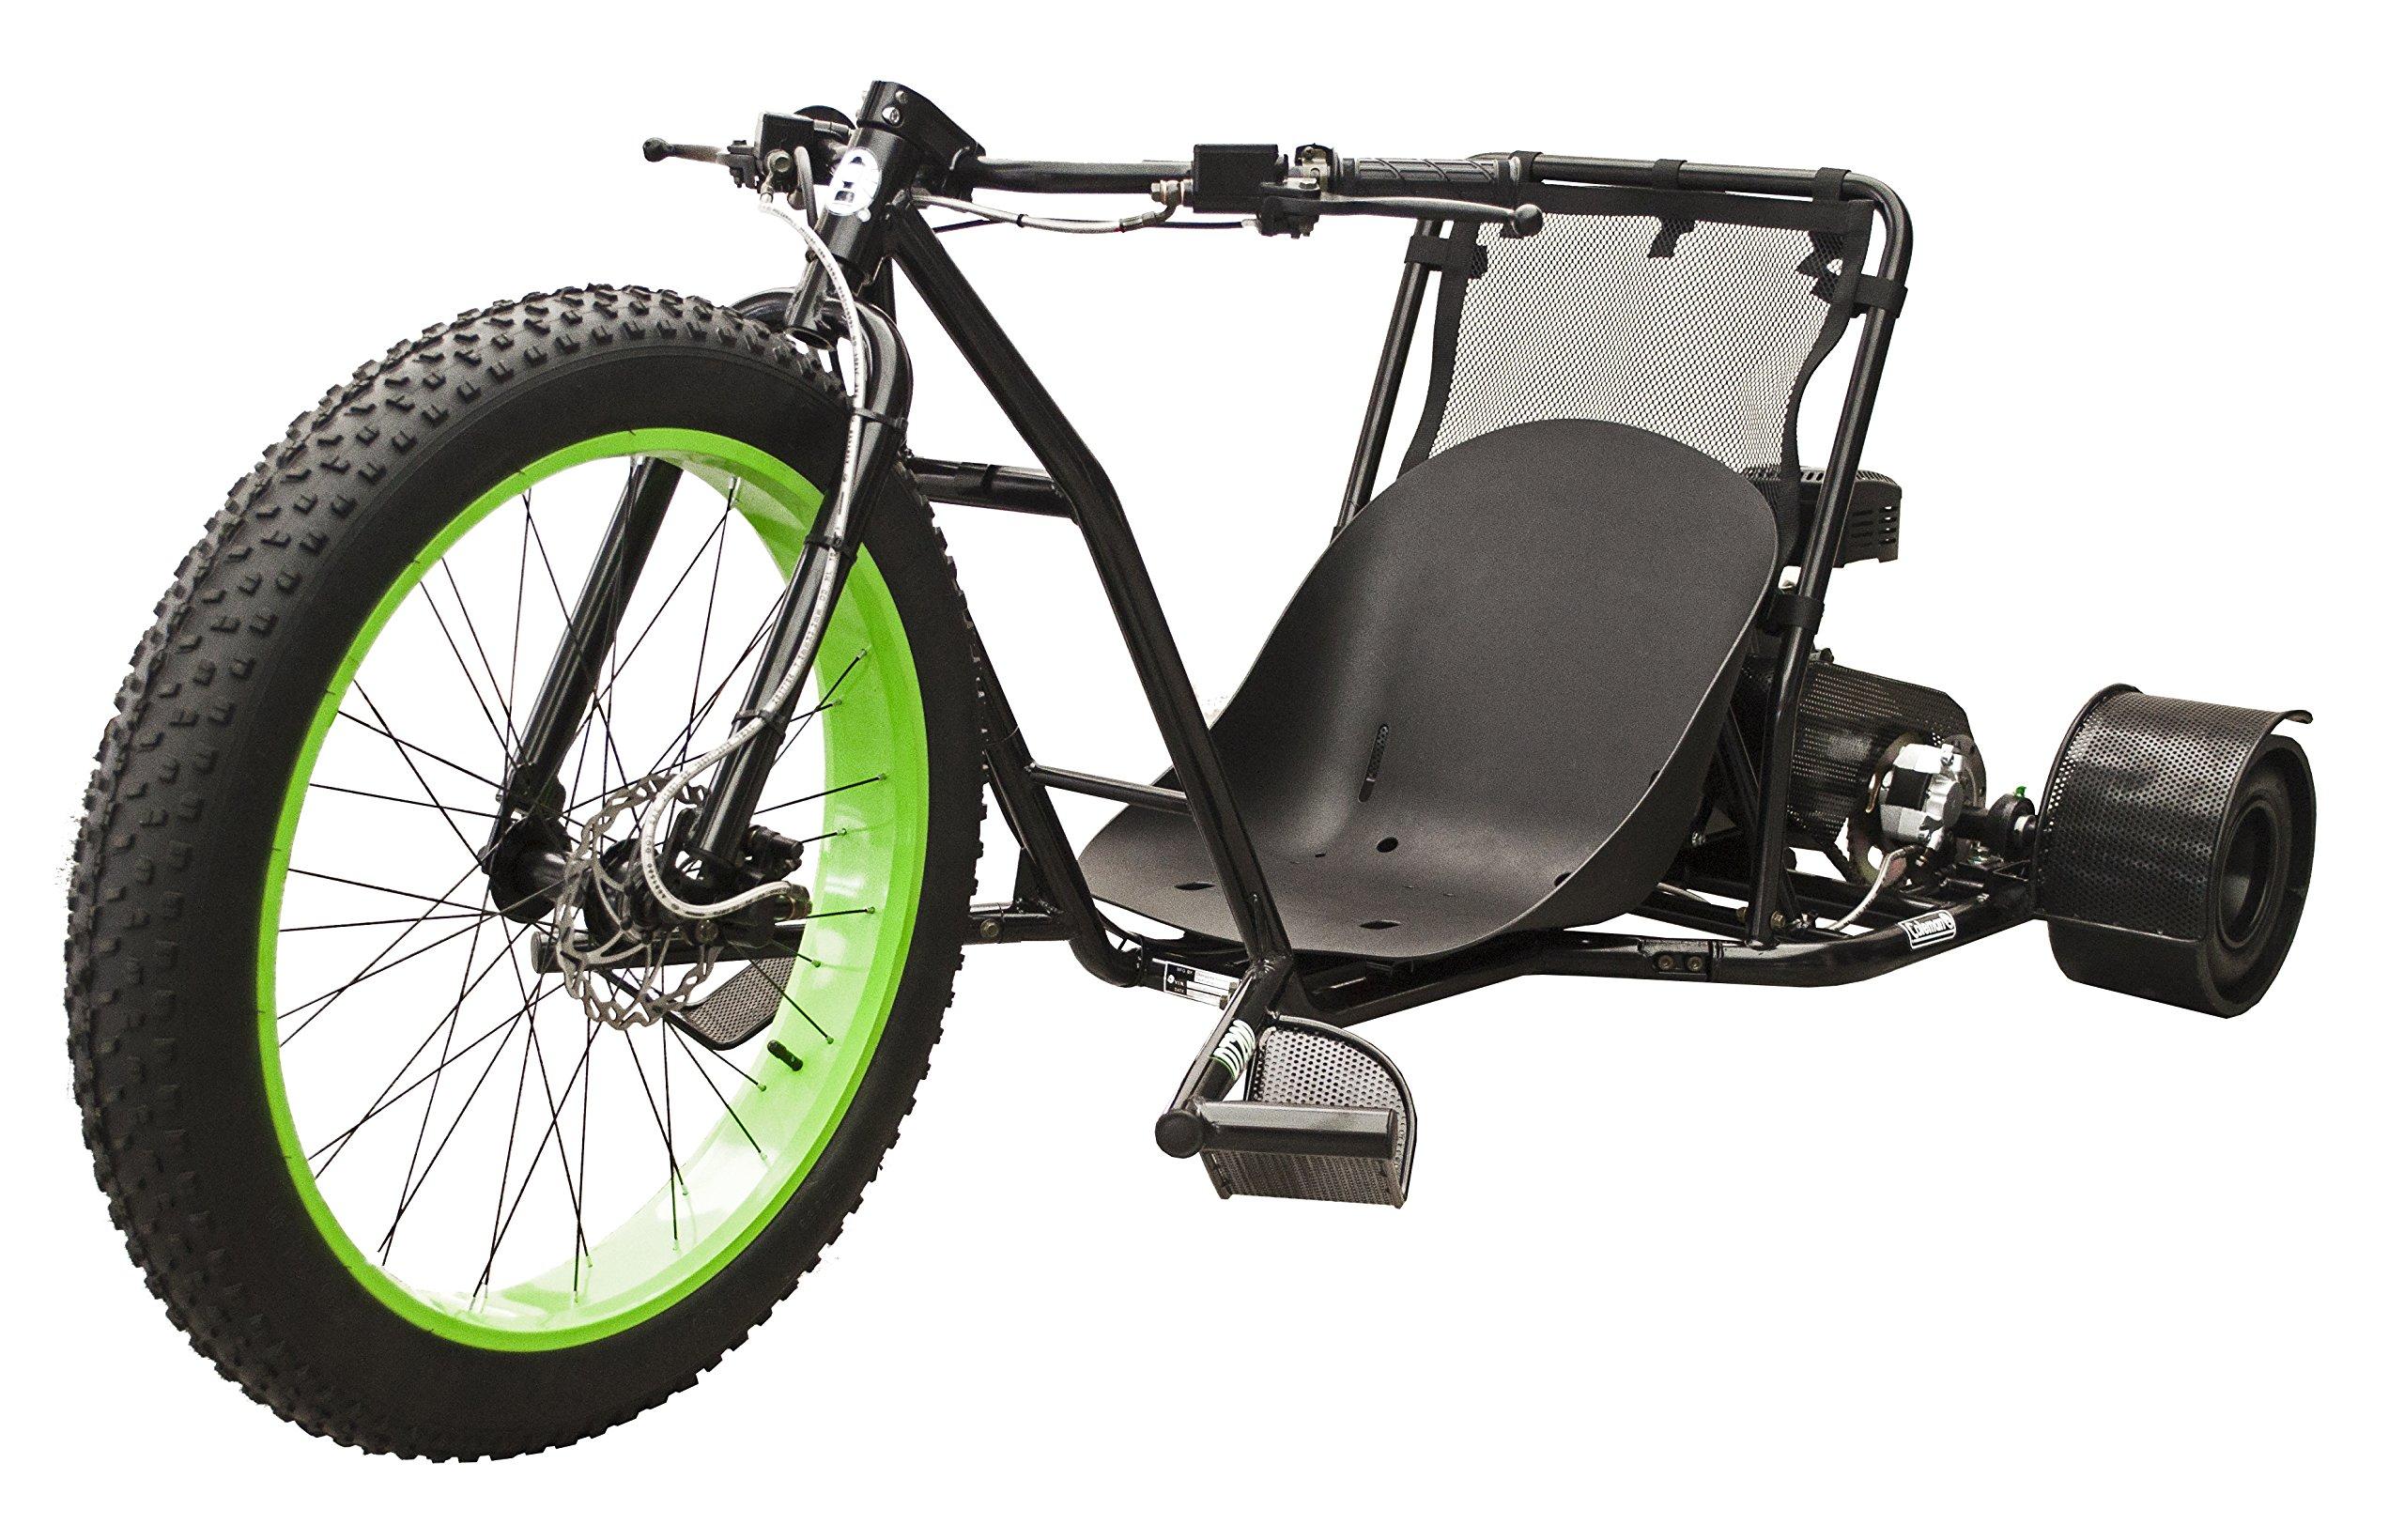 Coleman Powersports DT200 Gas powered Drift Trike